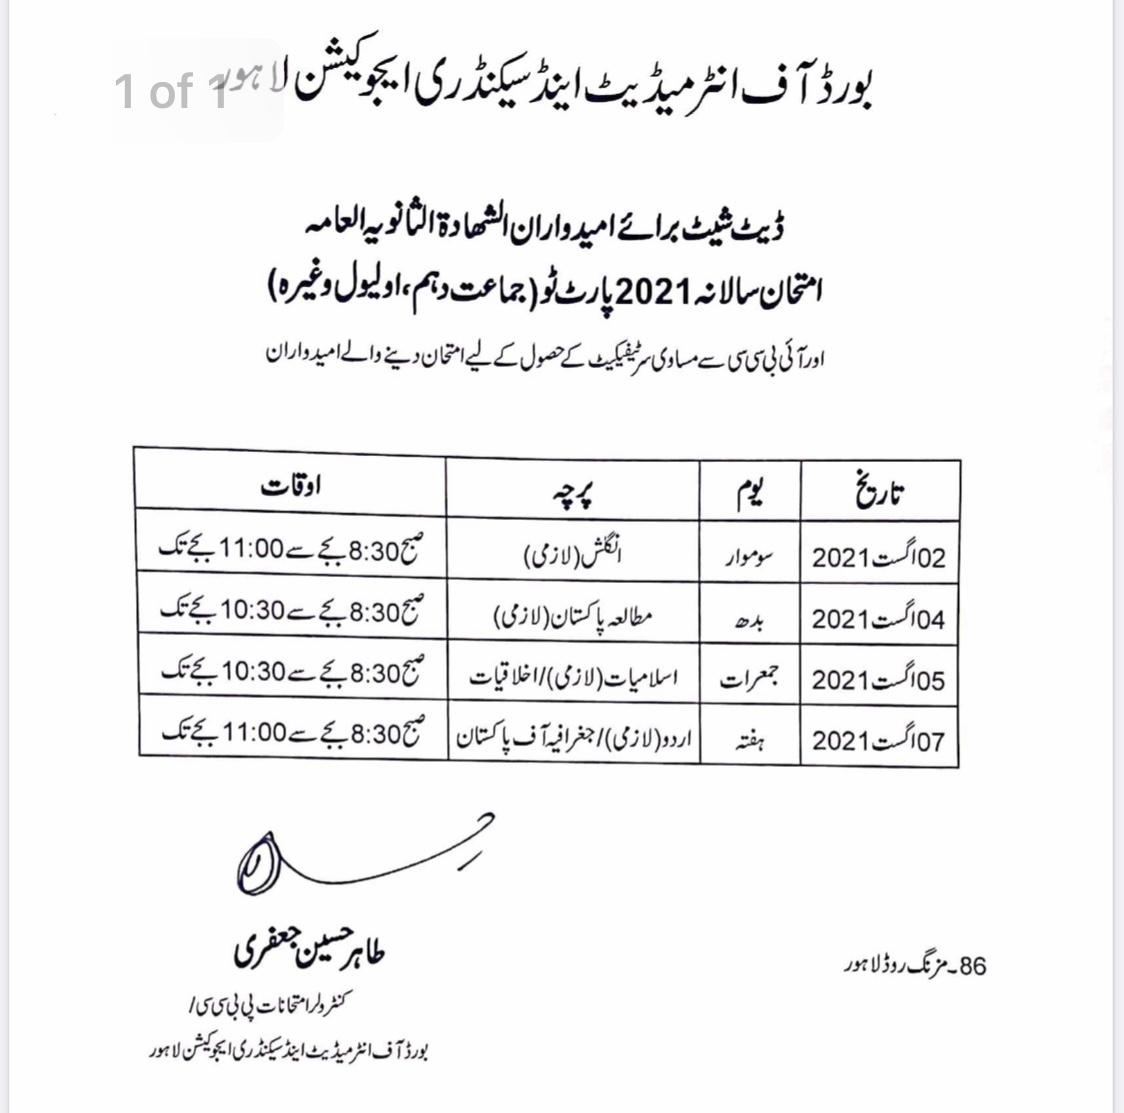 Date Sheet Class 10th Examination 2021 Shahadat al sanvia al aama